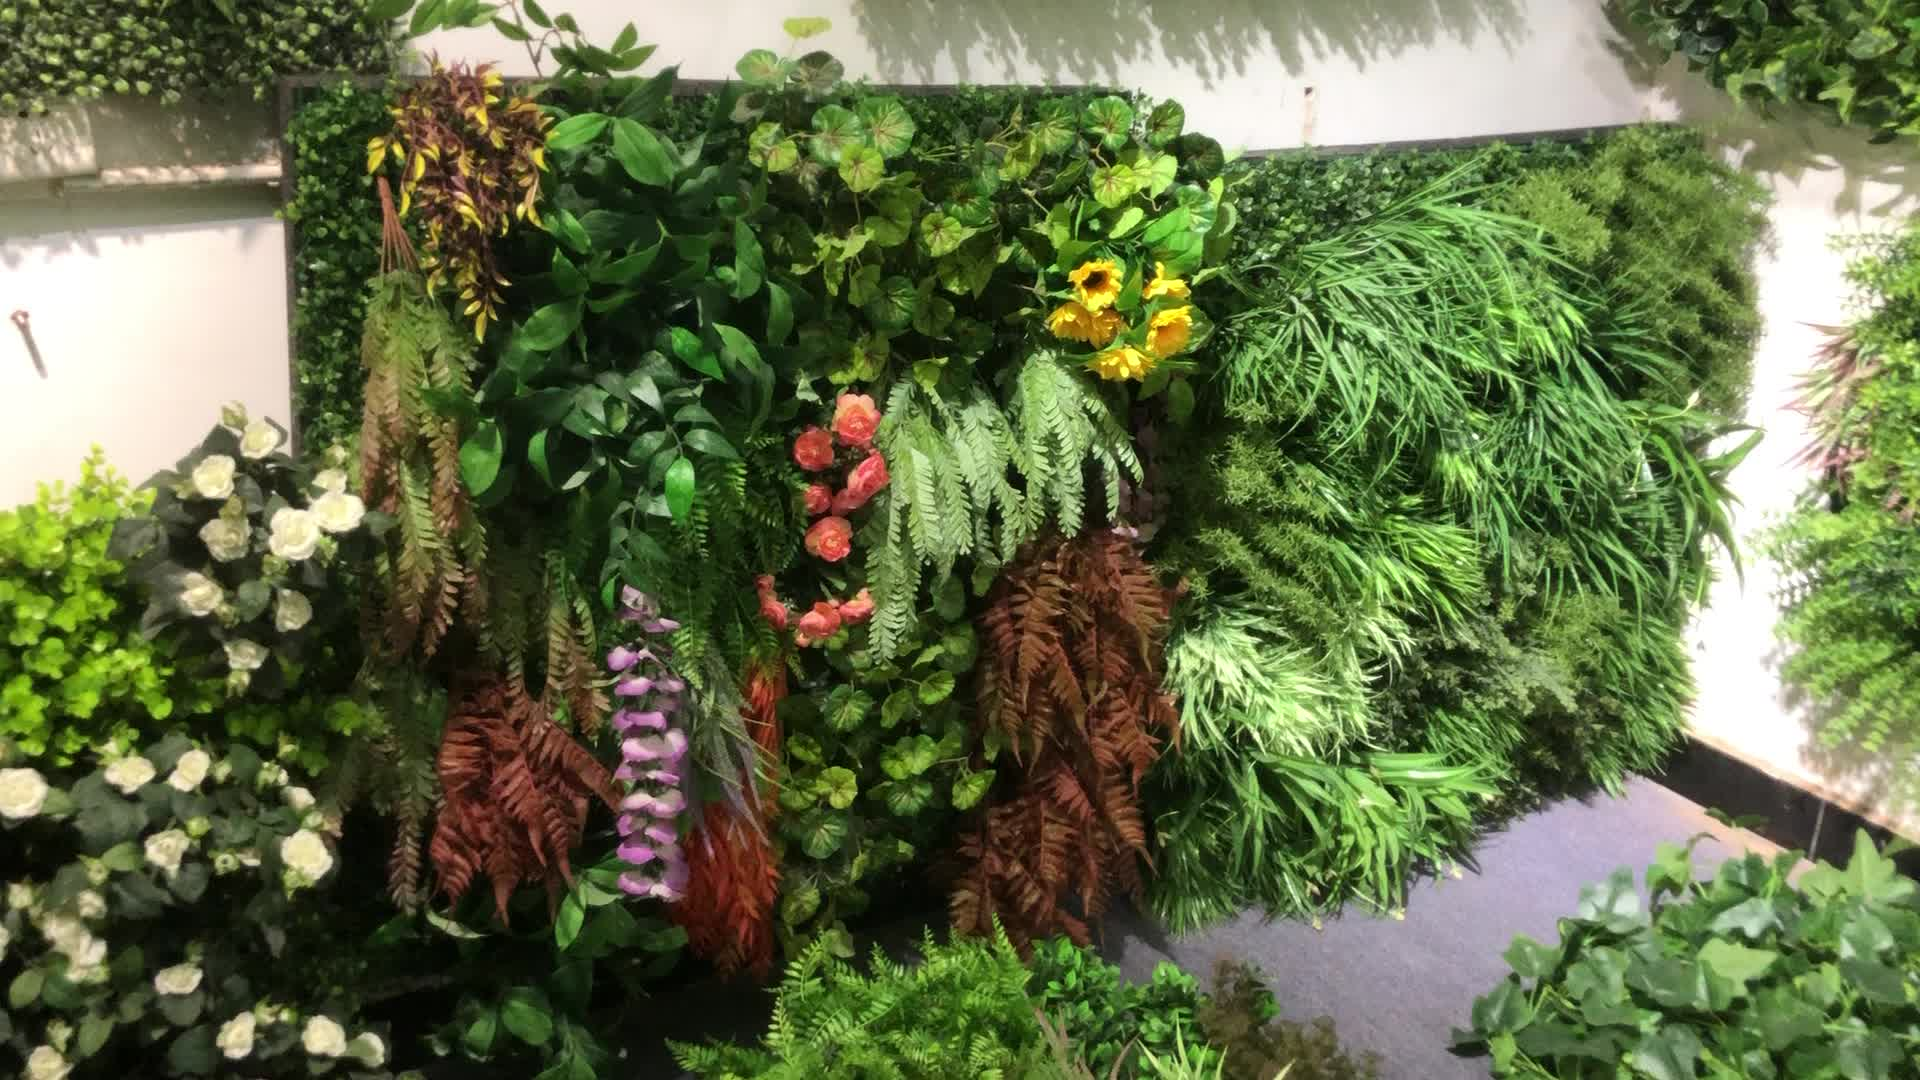 Atacado fábrica de plantas falsas simulado alta vertical de parede planta verde artificial